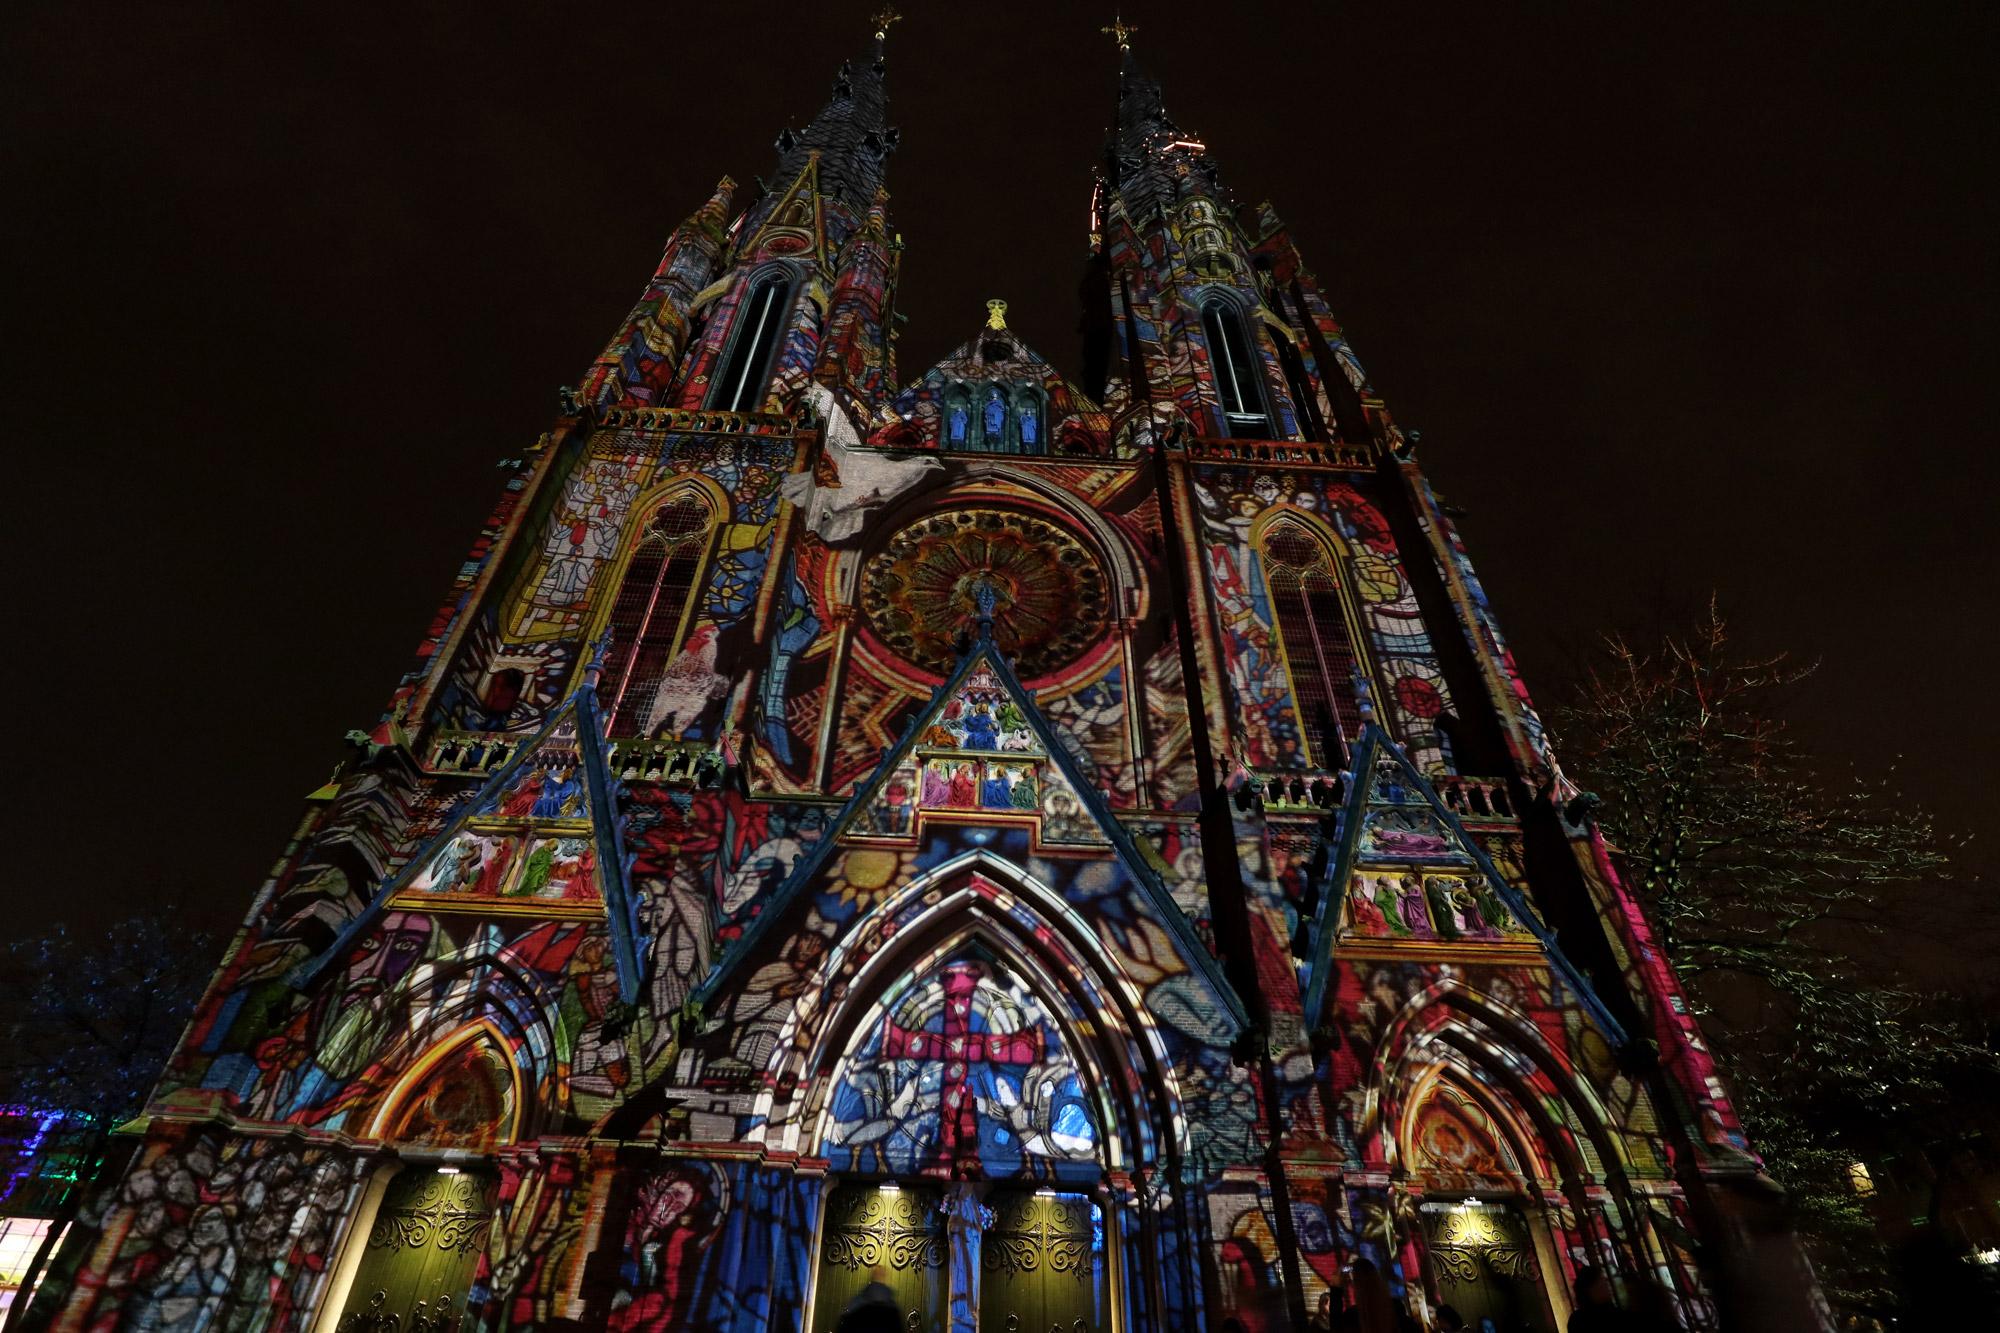 fotoverslag glow eindhoven 2017